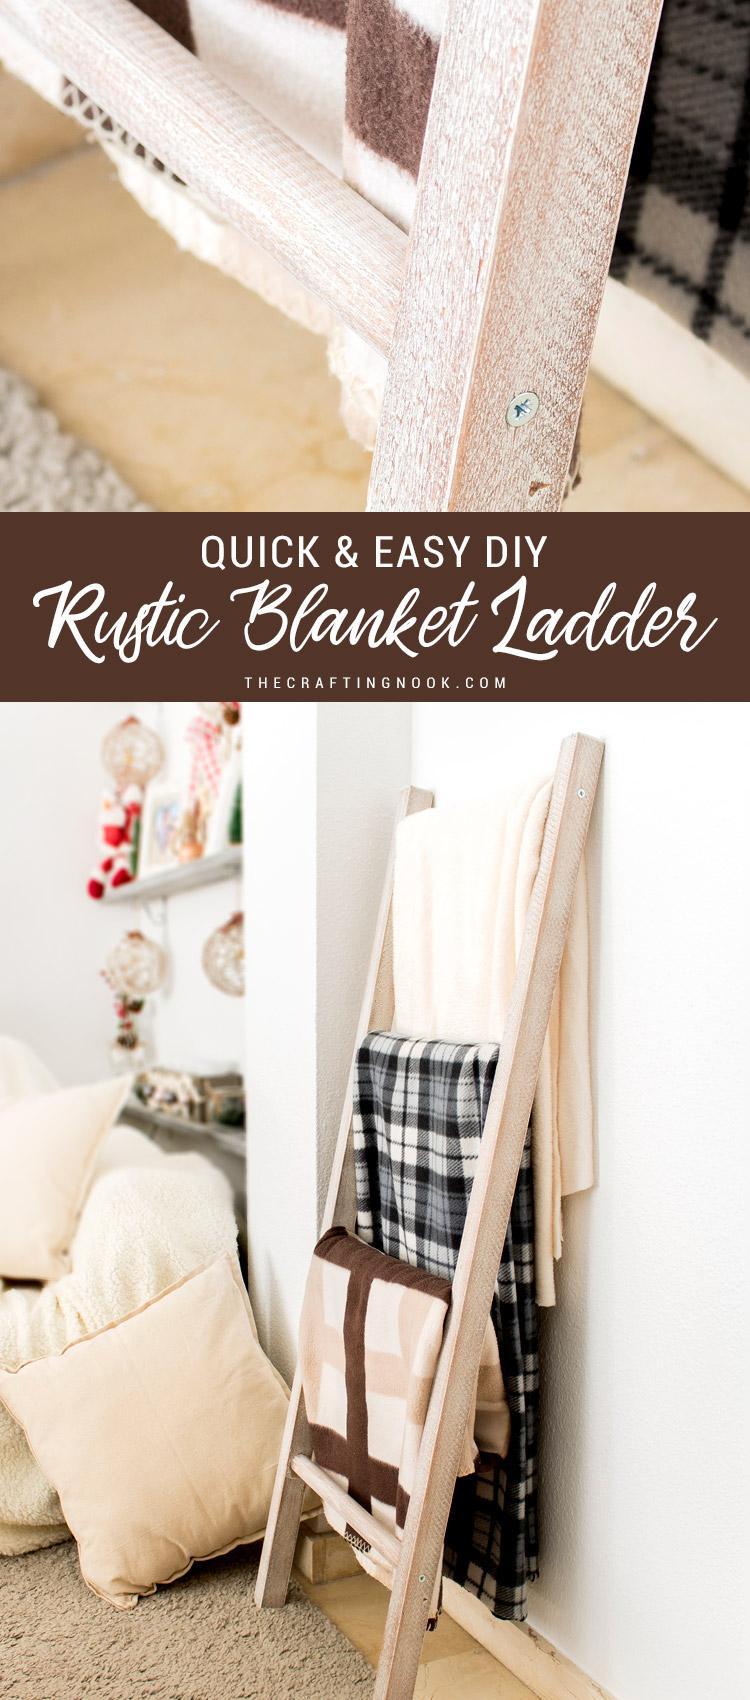 Quick & Easy DIY Rustic Blanket Ladder